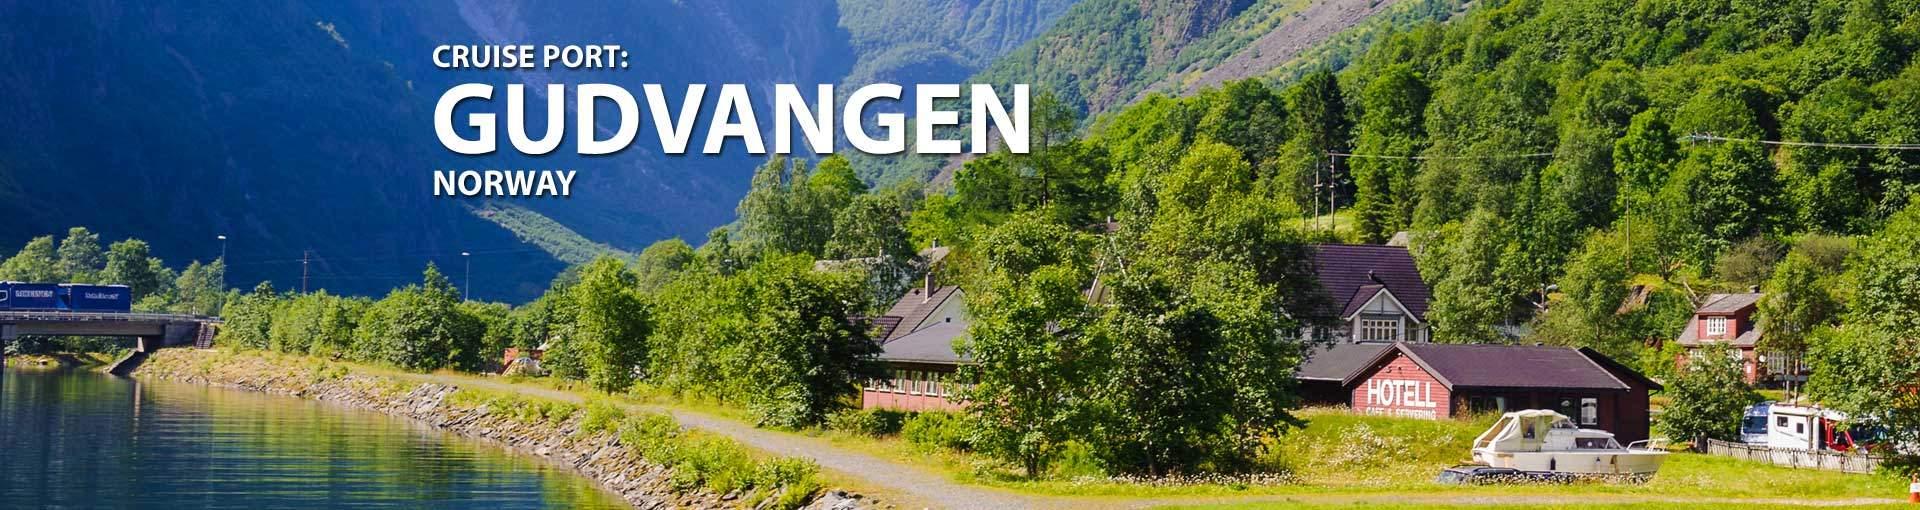 Cruises to Gudvangen, Norway